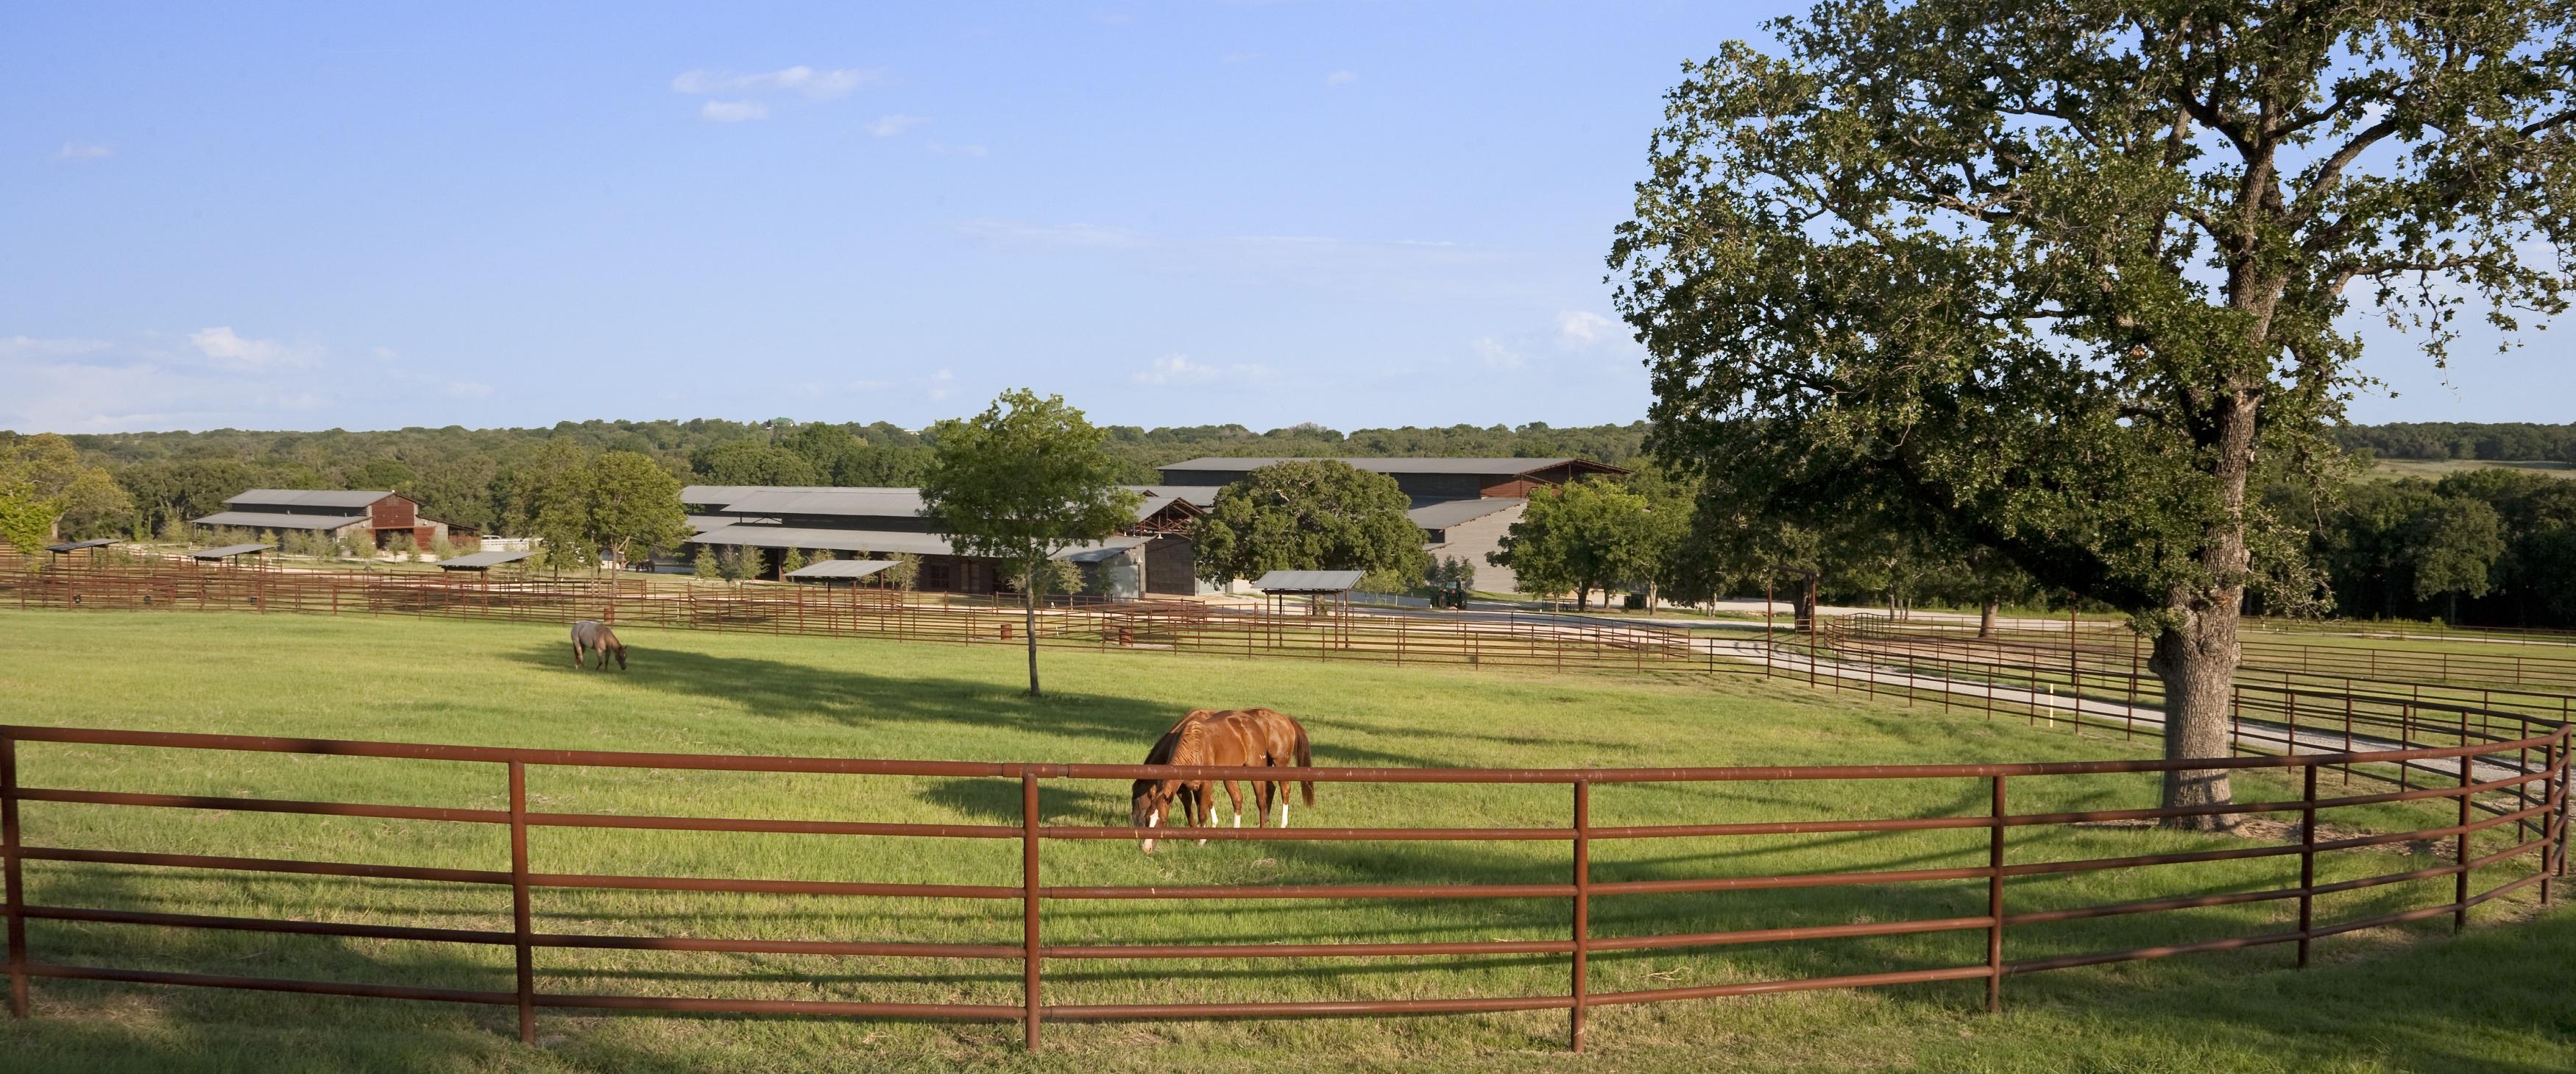 Cutting Horse Ranch